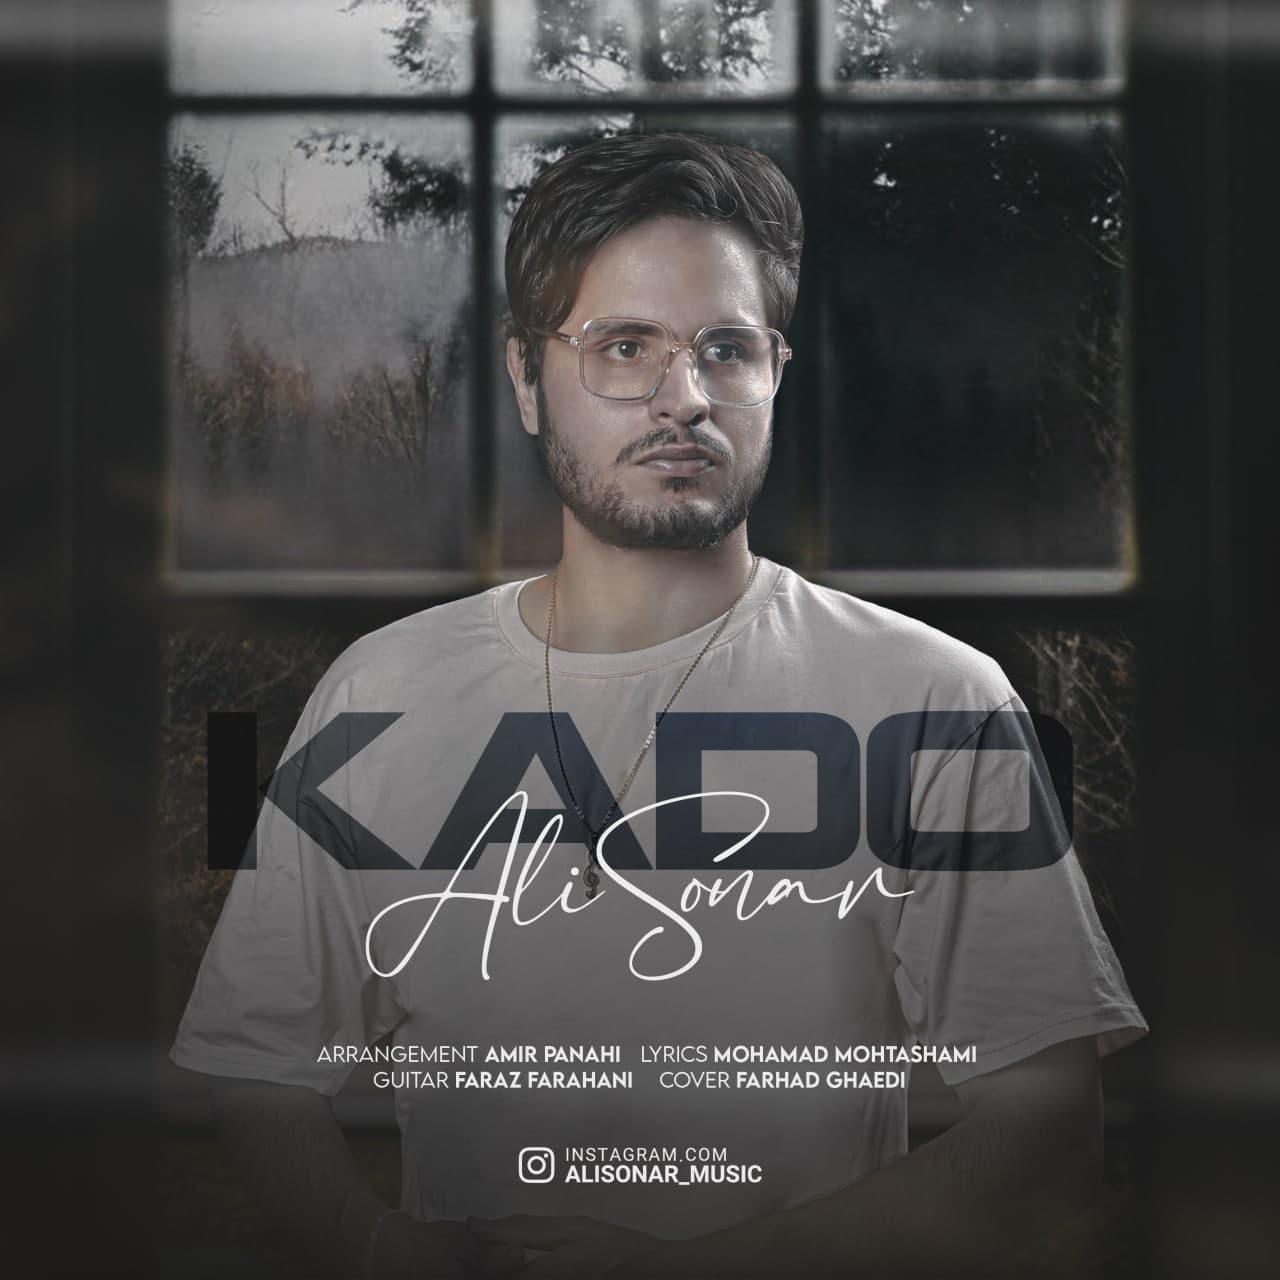 Download Ahang علی سونار کادو